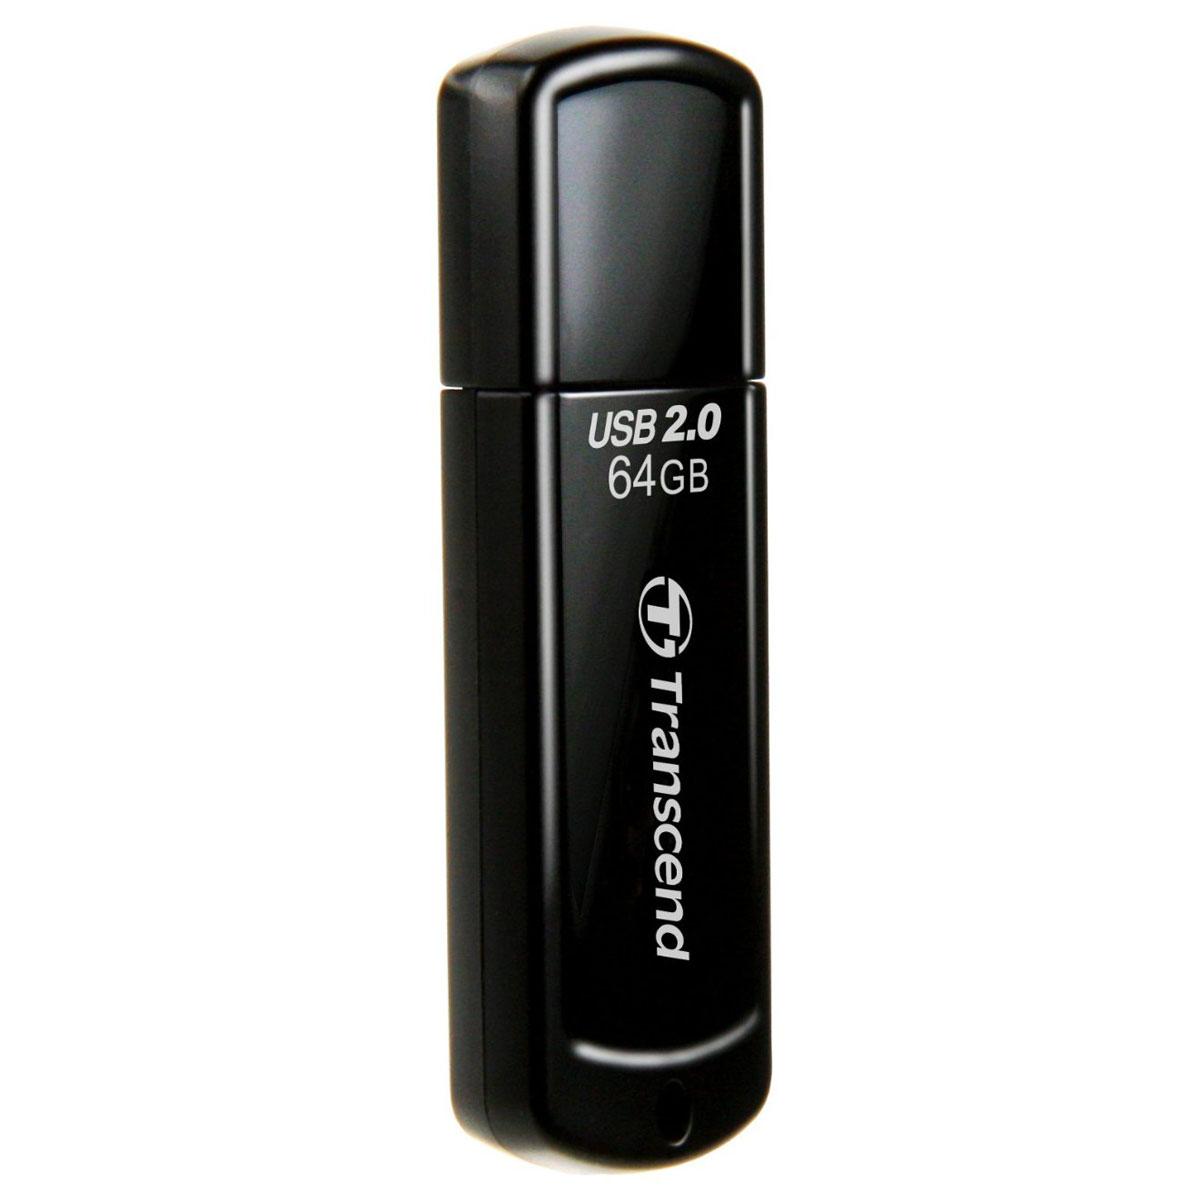 Transcend JetFlash 350 64GB USB-накопитель - Носители информации